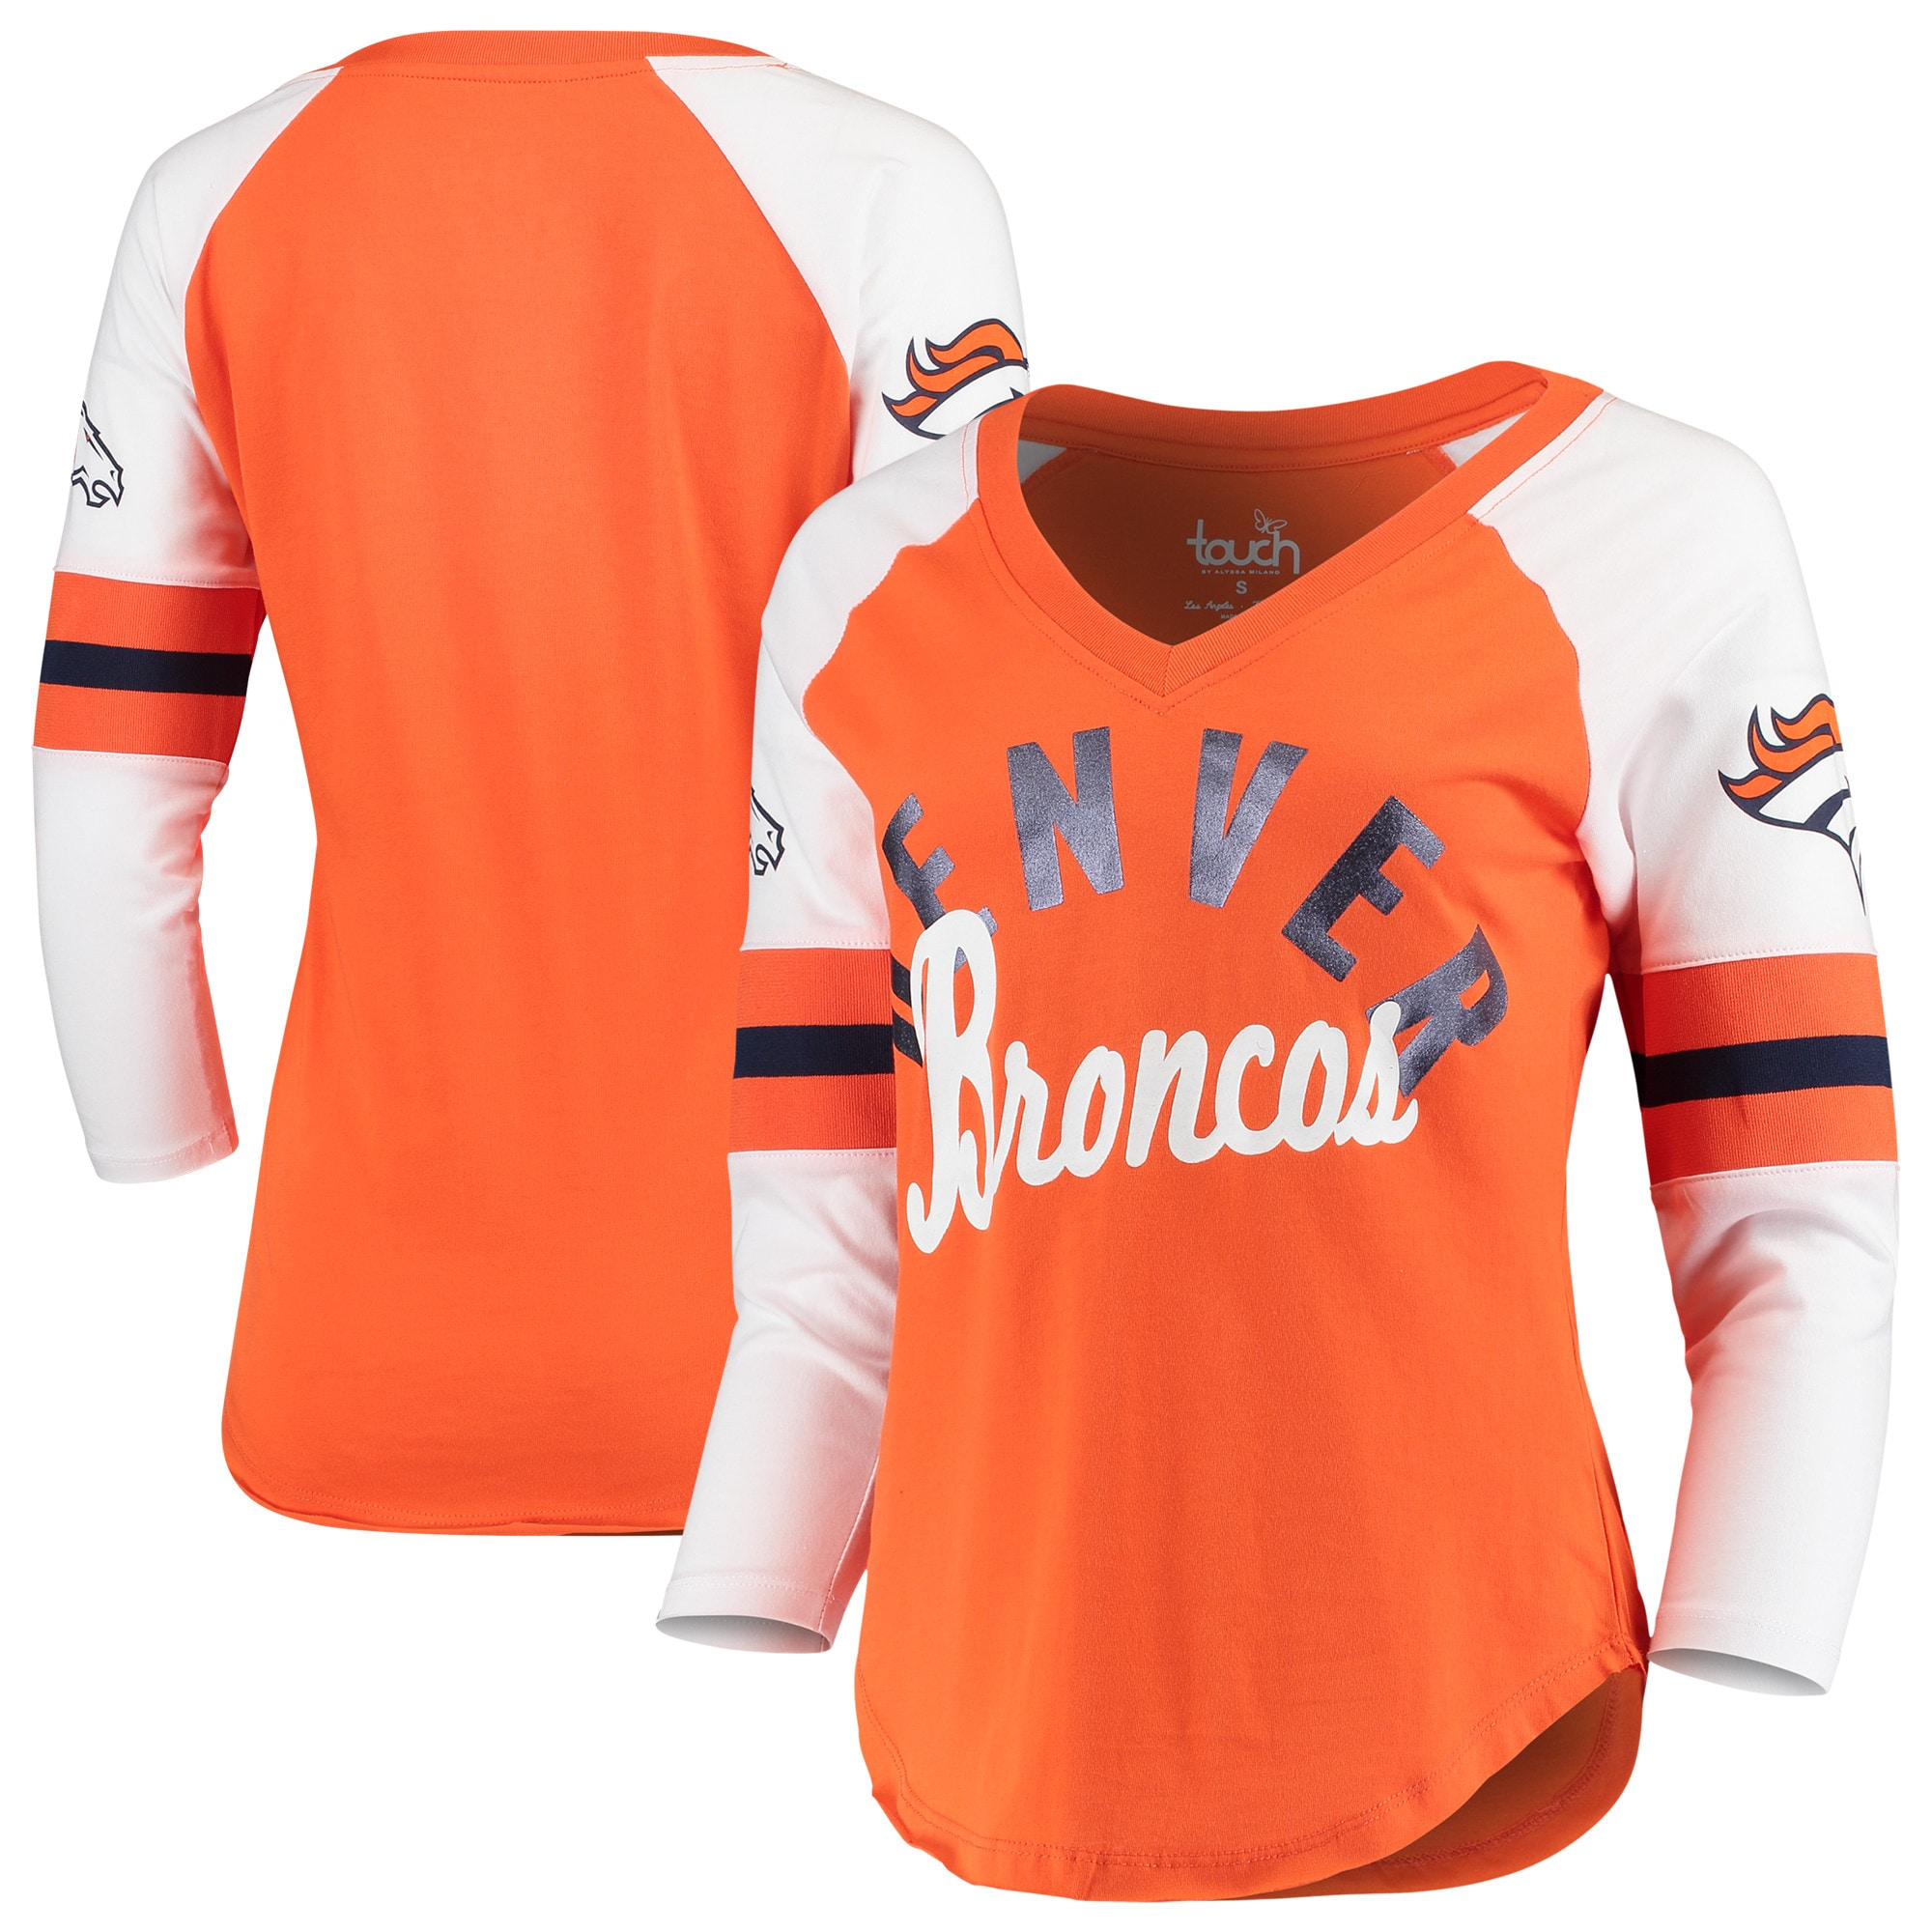 Denver Broncos Touch by Alyssa Milano Women's Reflex 3/4-Sleeve Raglan V-Neck T-Shirt - Orange/White